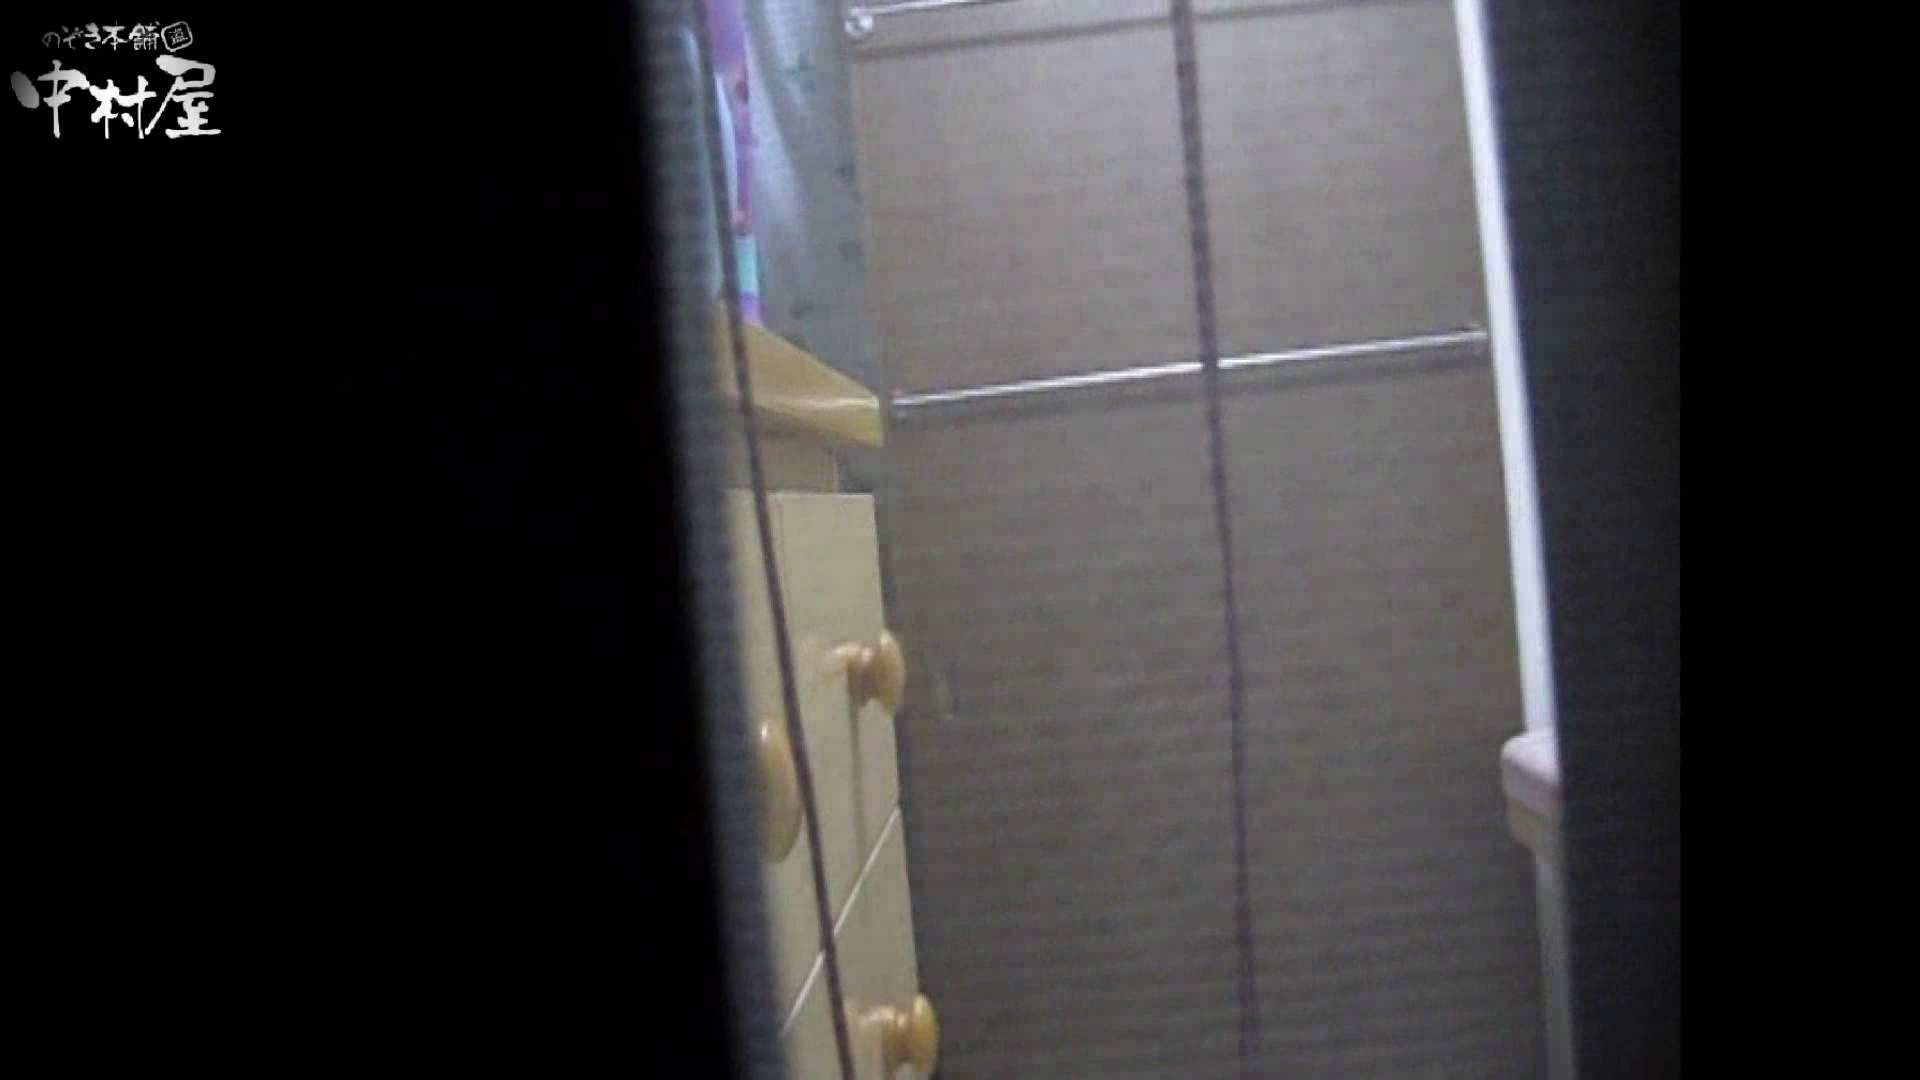 民家風呂専門盗撮師の超危険映像 vol.005 美少女のエロ生活  52連発 12